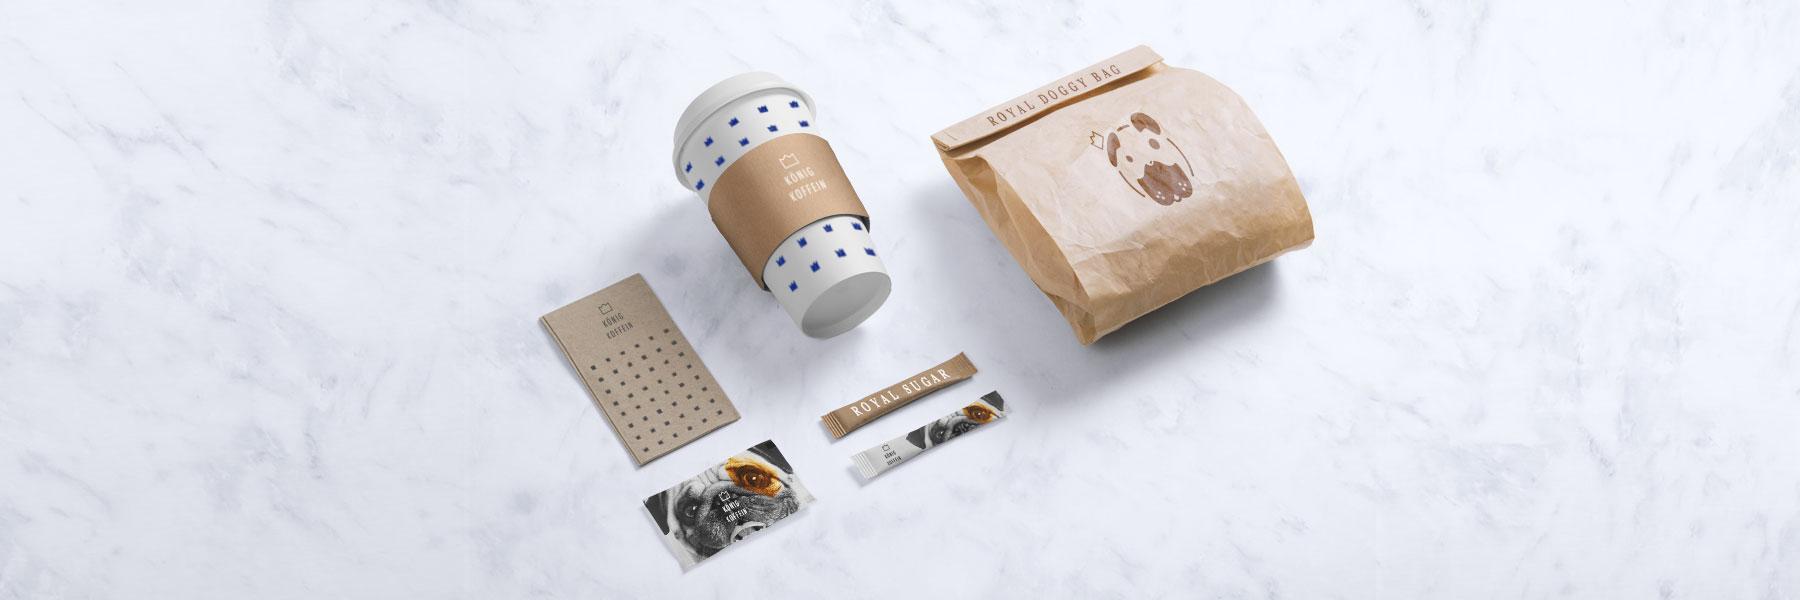 koenig-koffein-mobiles-kaffee-catering-branding-optionen